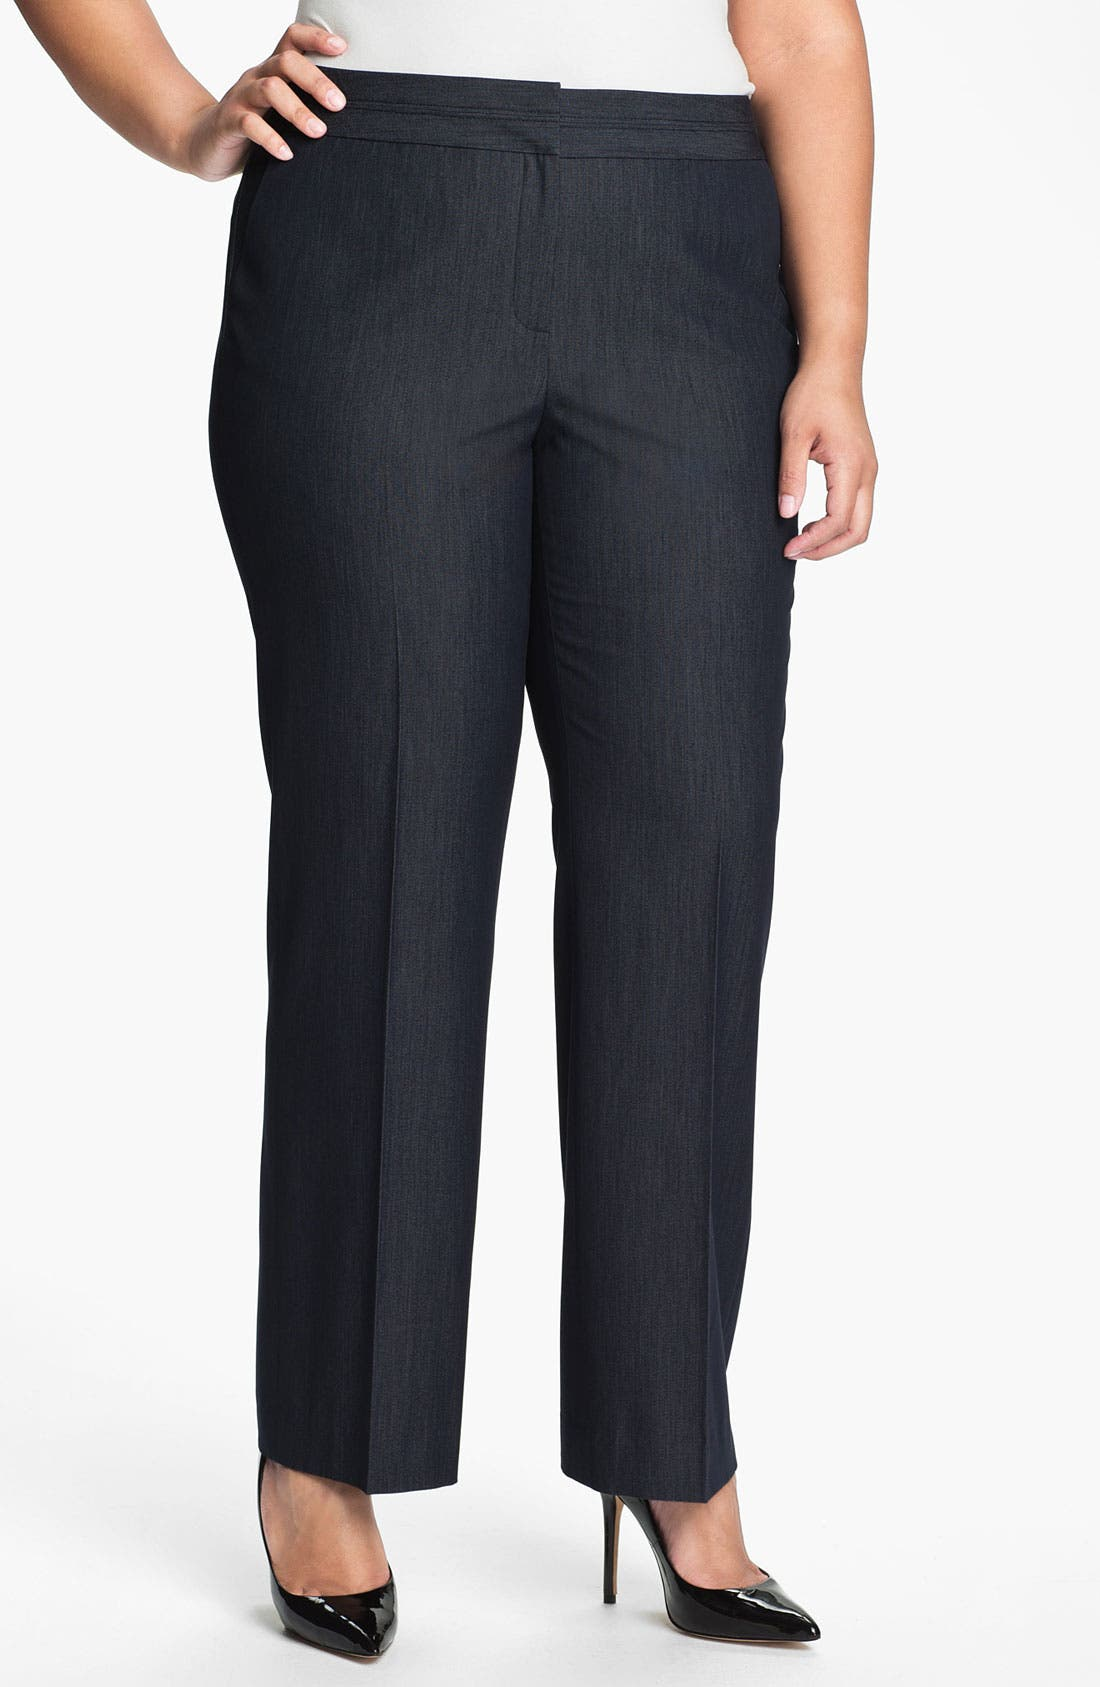 Alternate Image 1 Selected - Sejour 'Bluescreen' Suit Trousers (Plus)